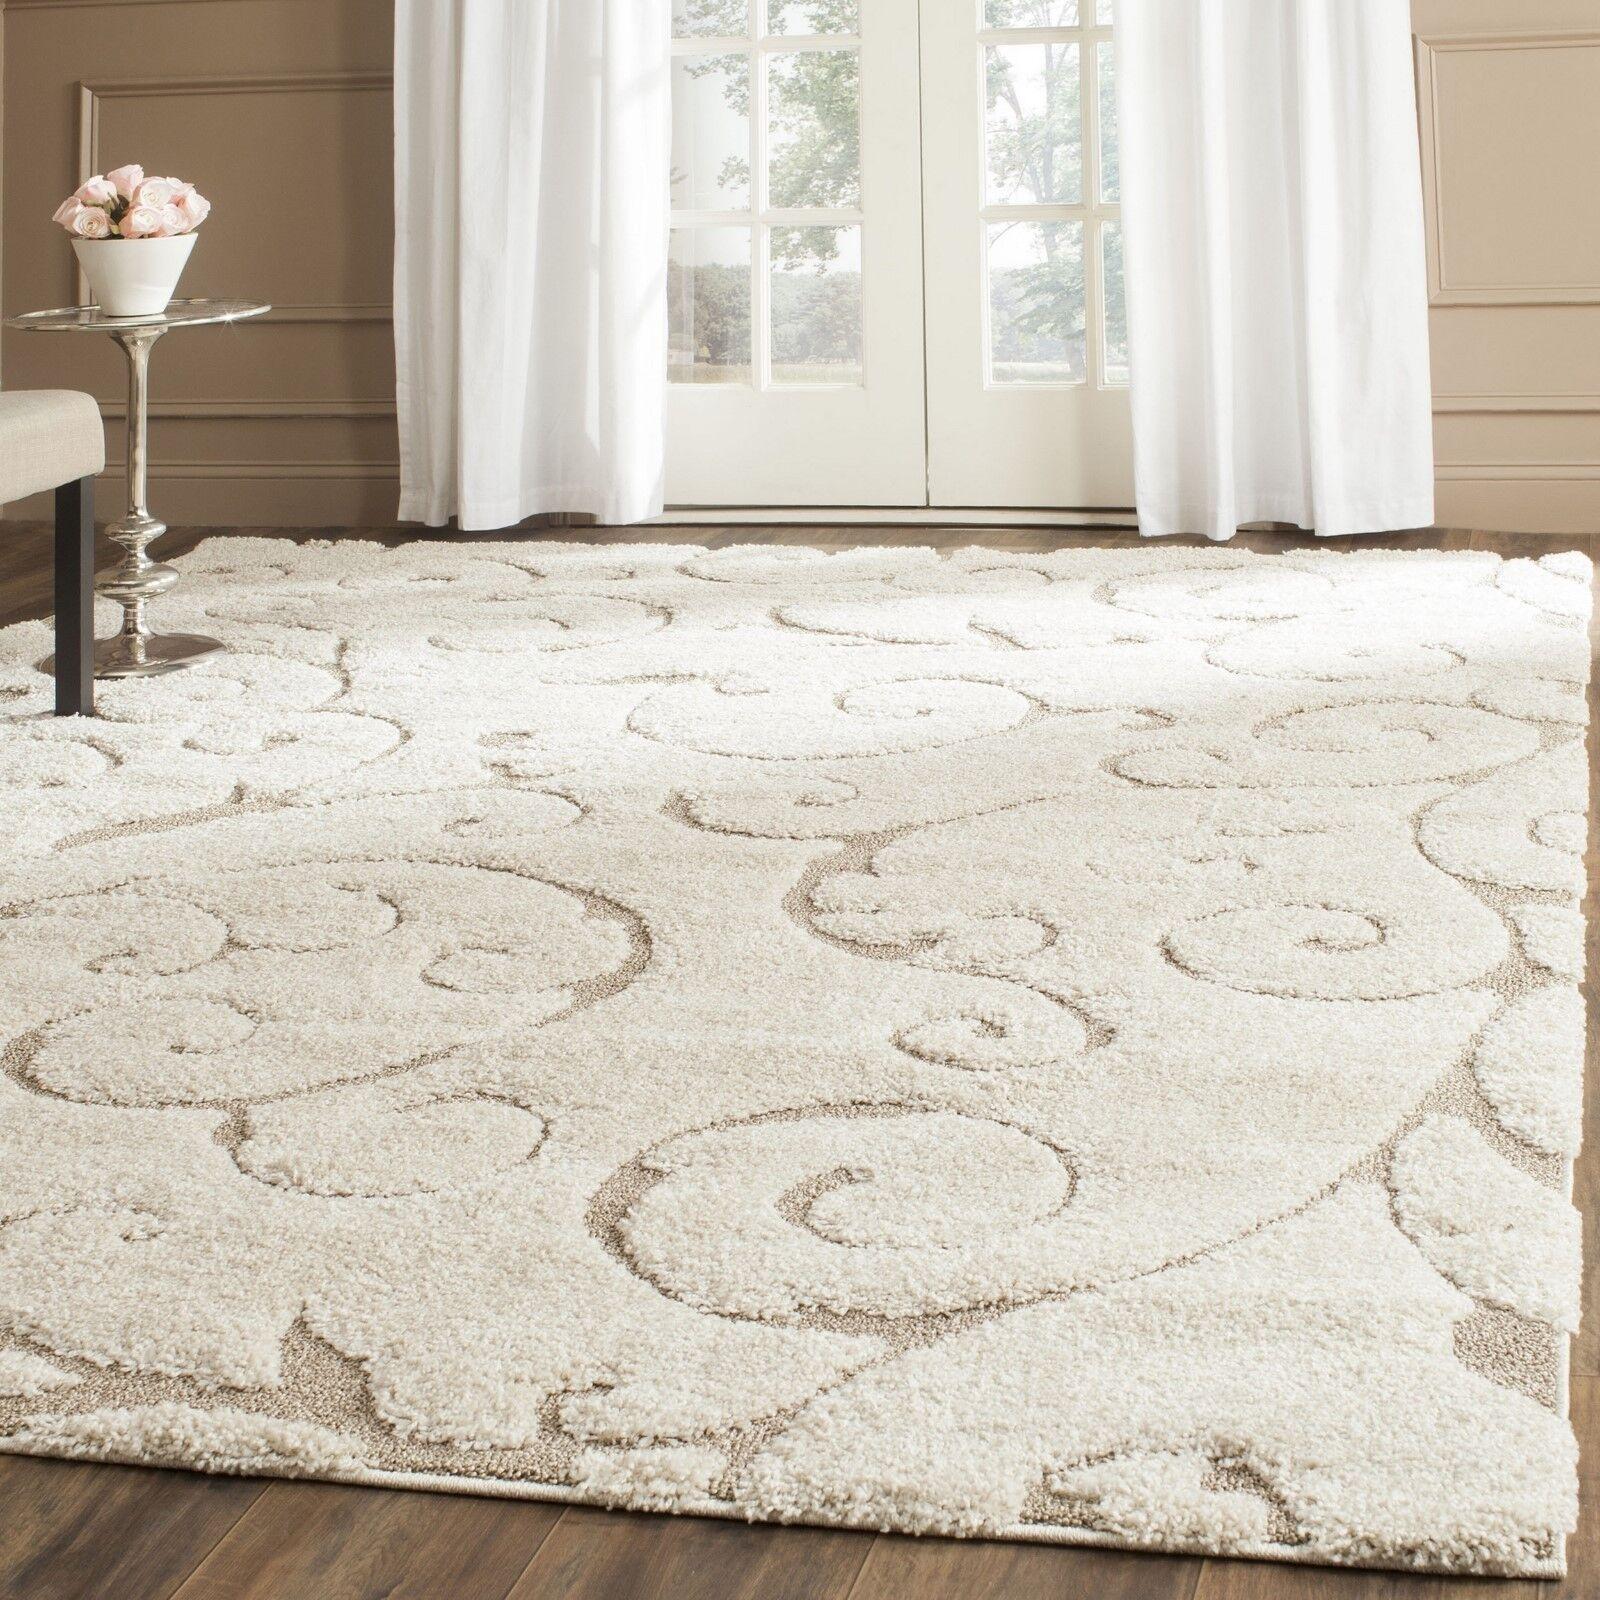 Contemporary Kitchen Rugs: Modern Area Rug Shag Carpet Floor Dining Living Room